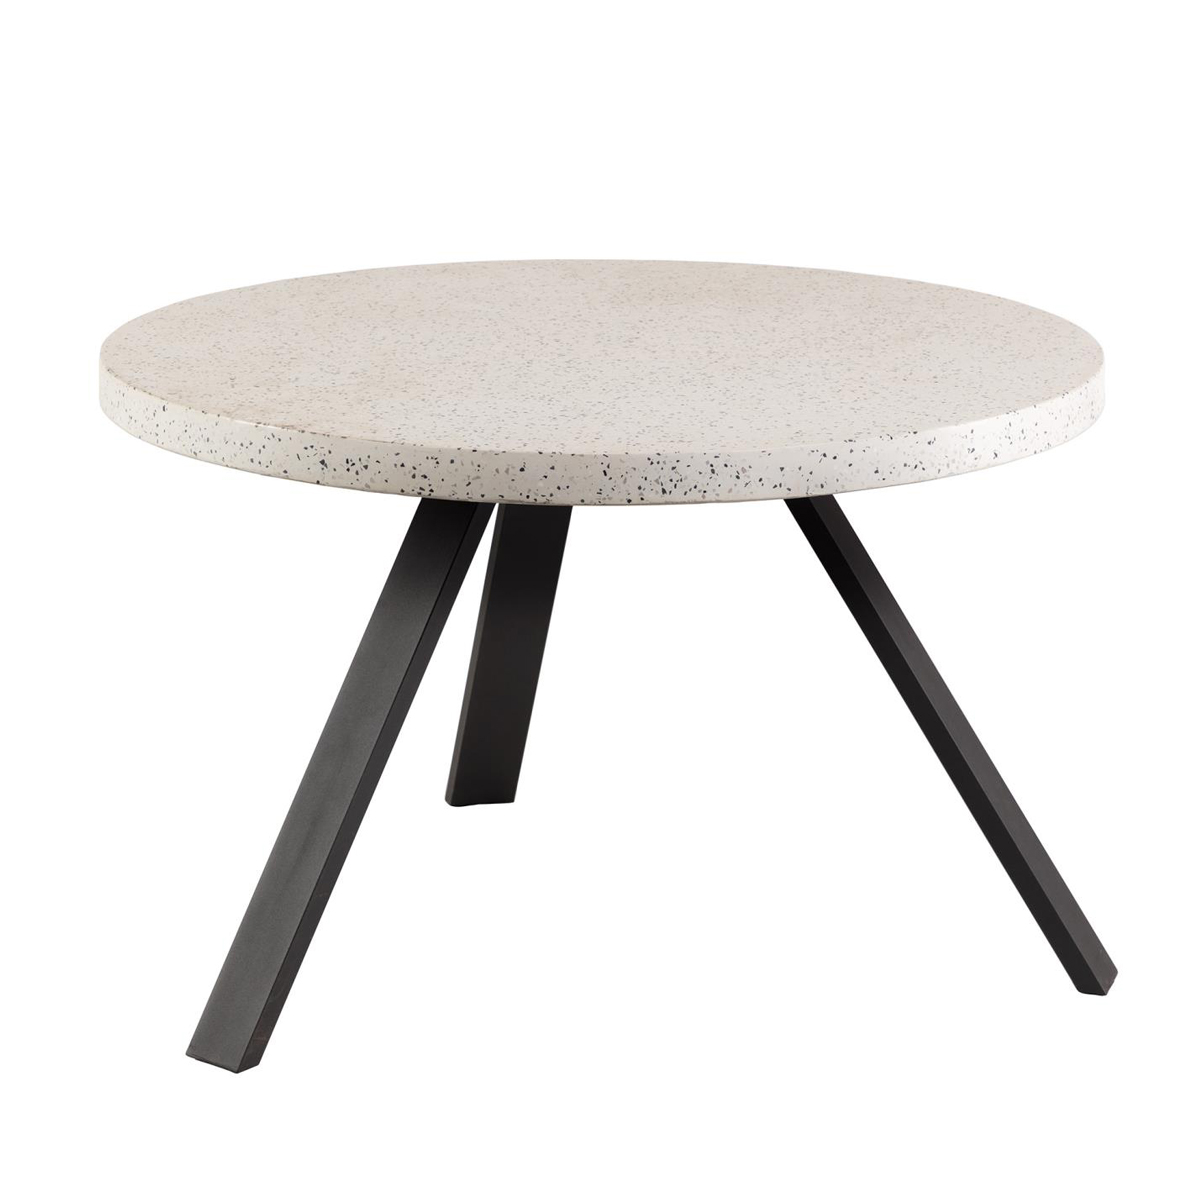 Table basse ronde à effet granite - Blanc - D 120 x H 76 cm